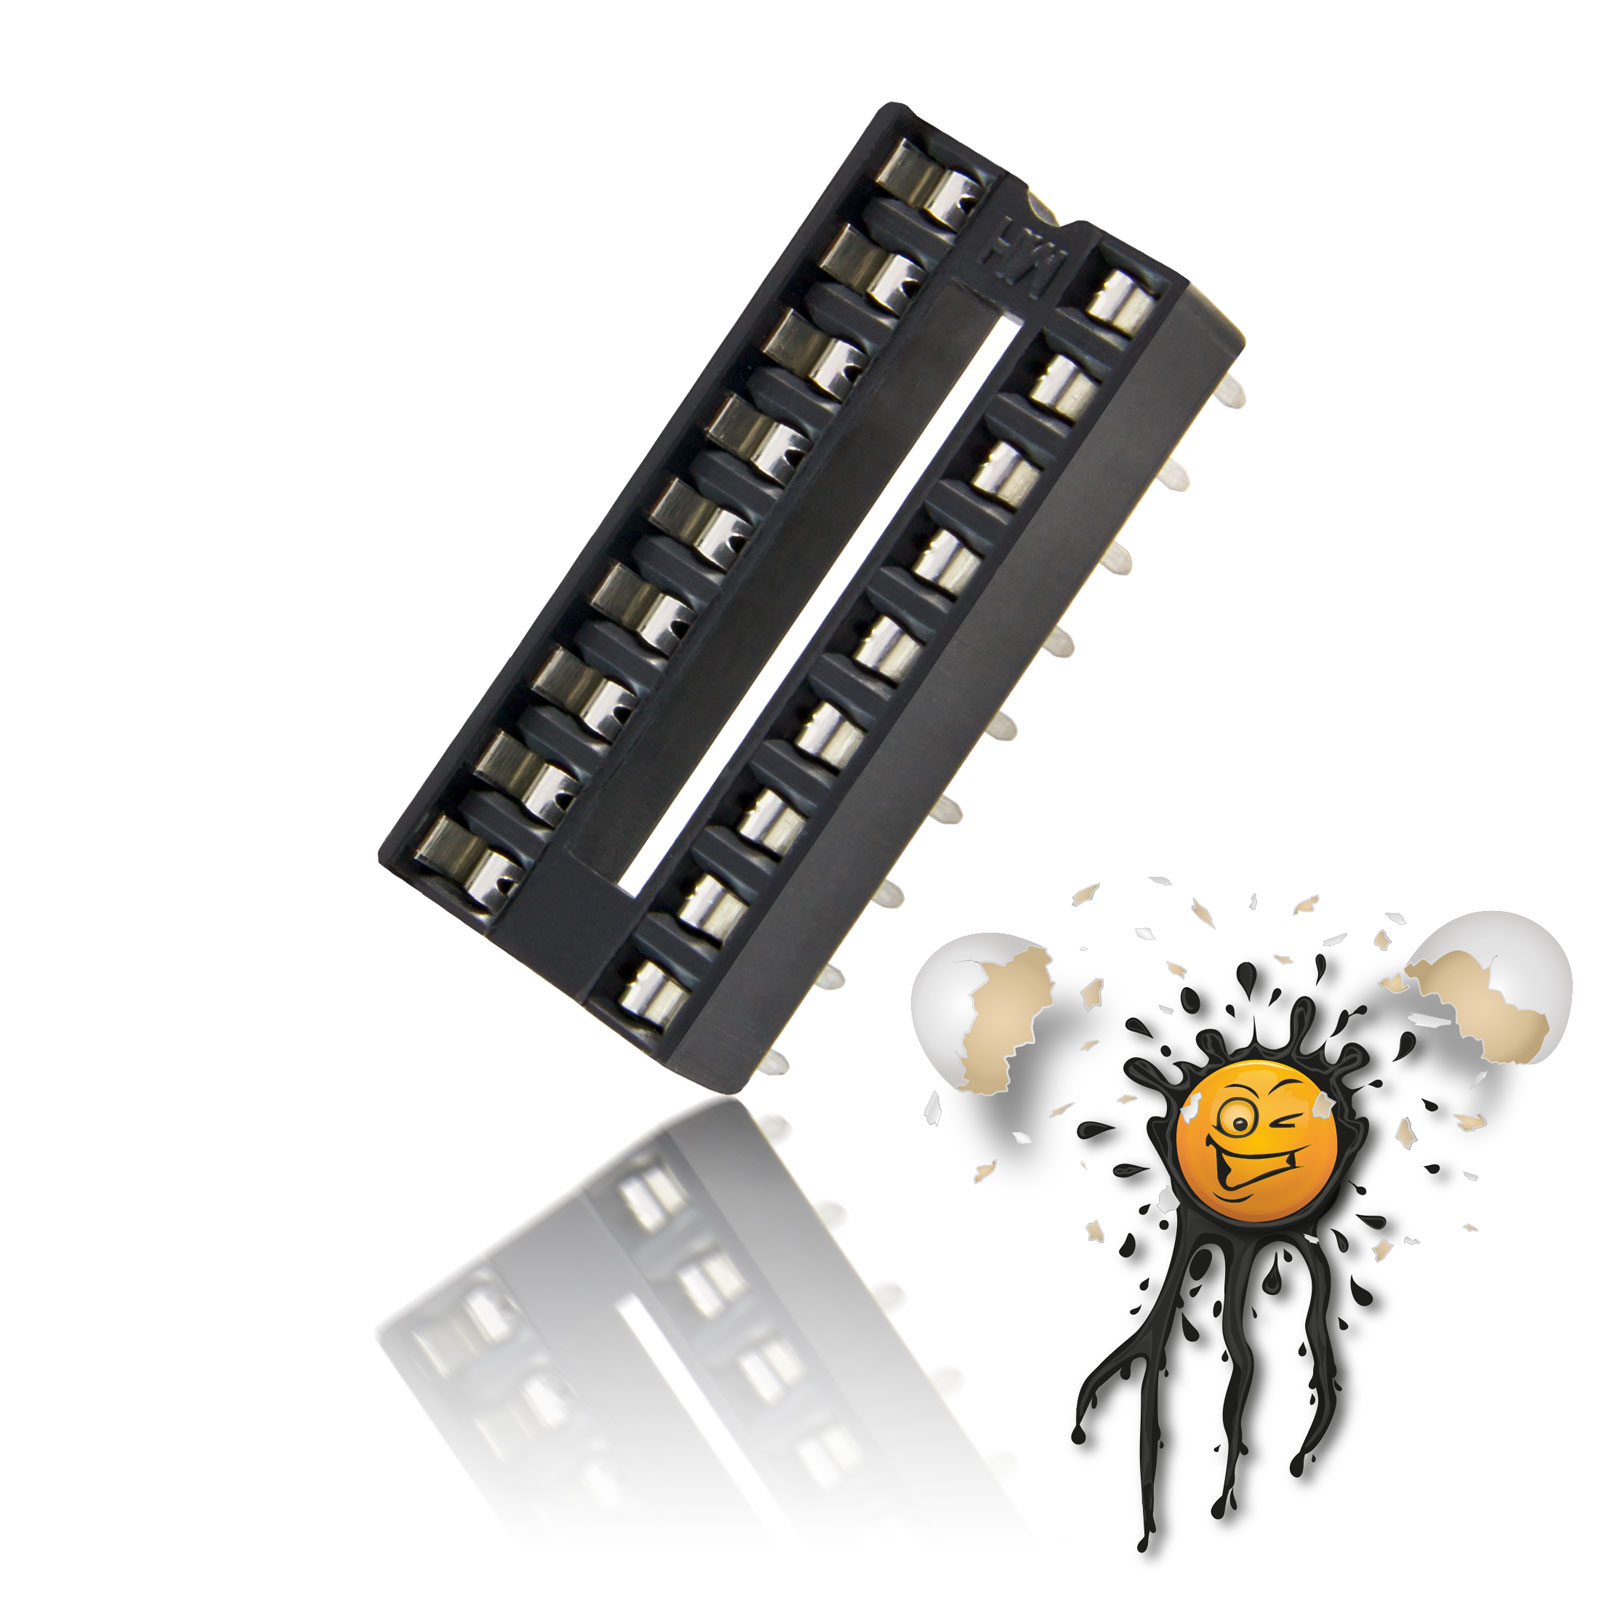 2 row 8 pin socket